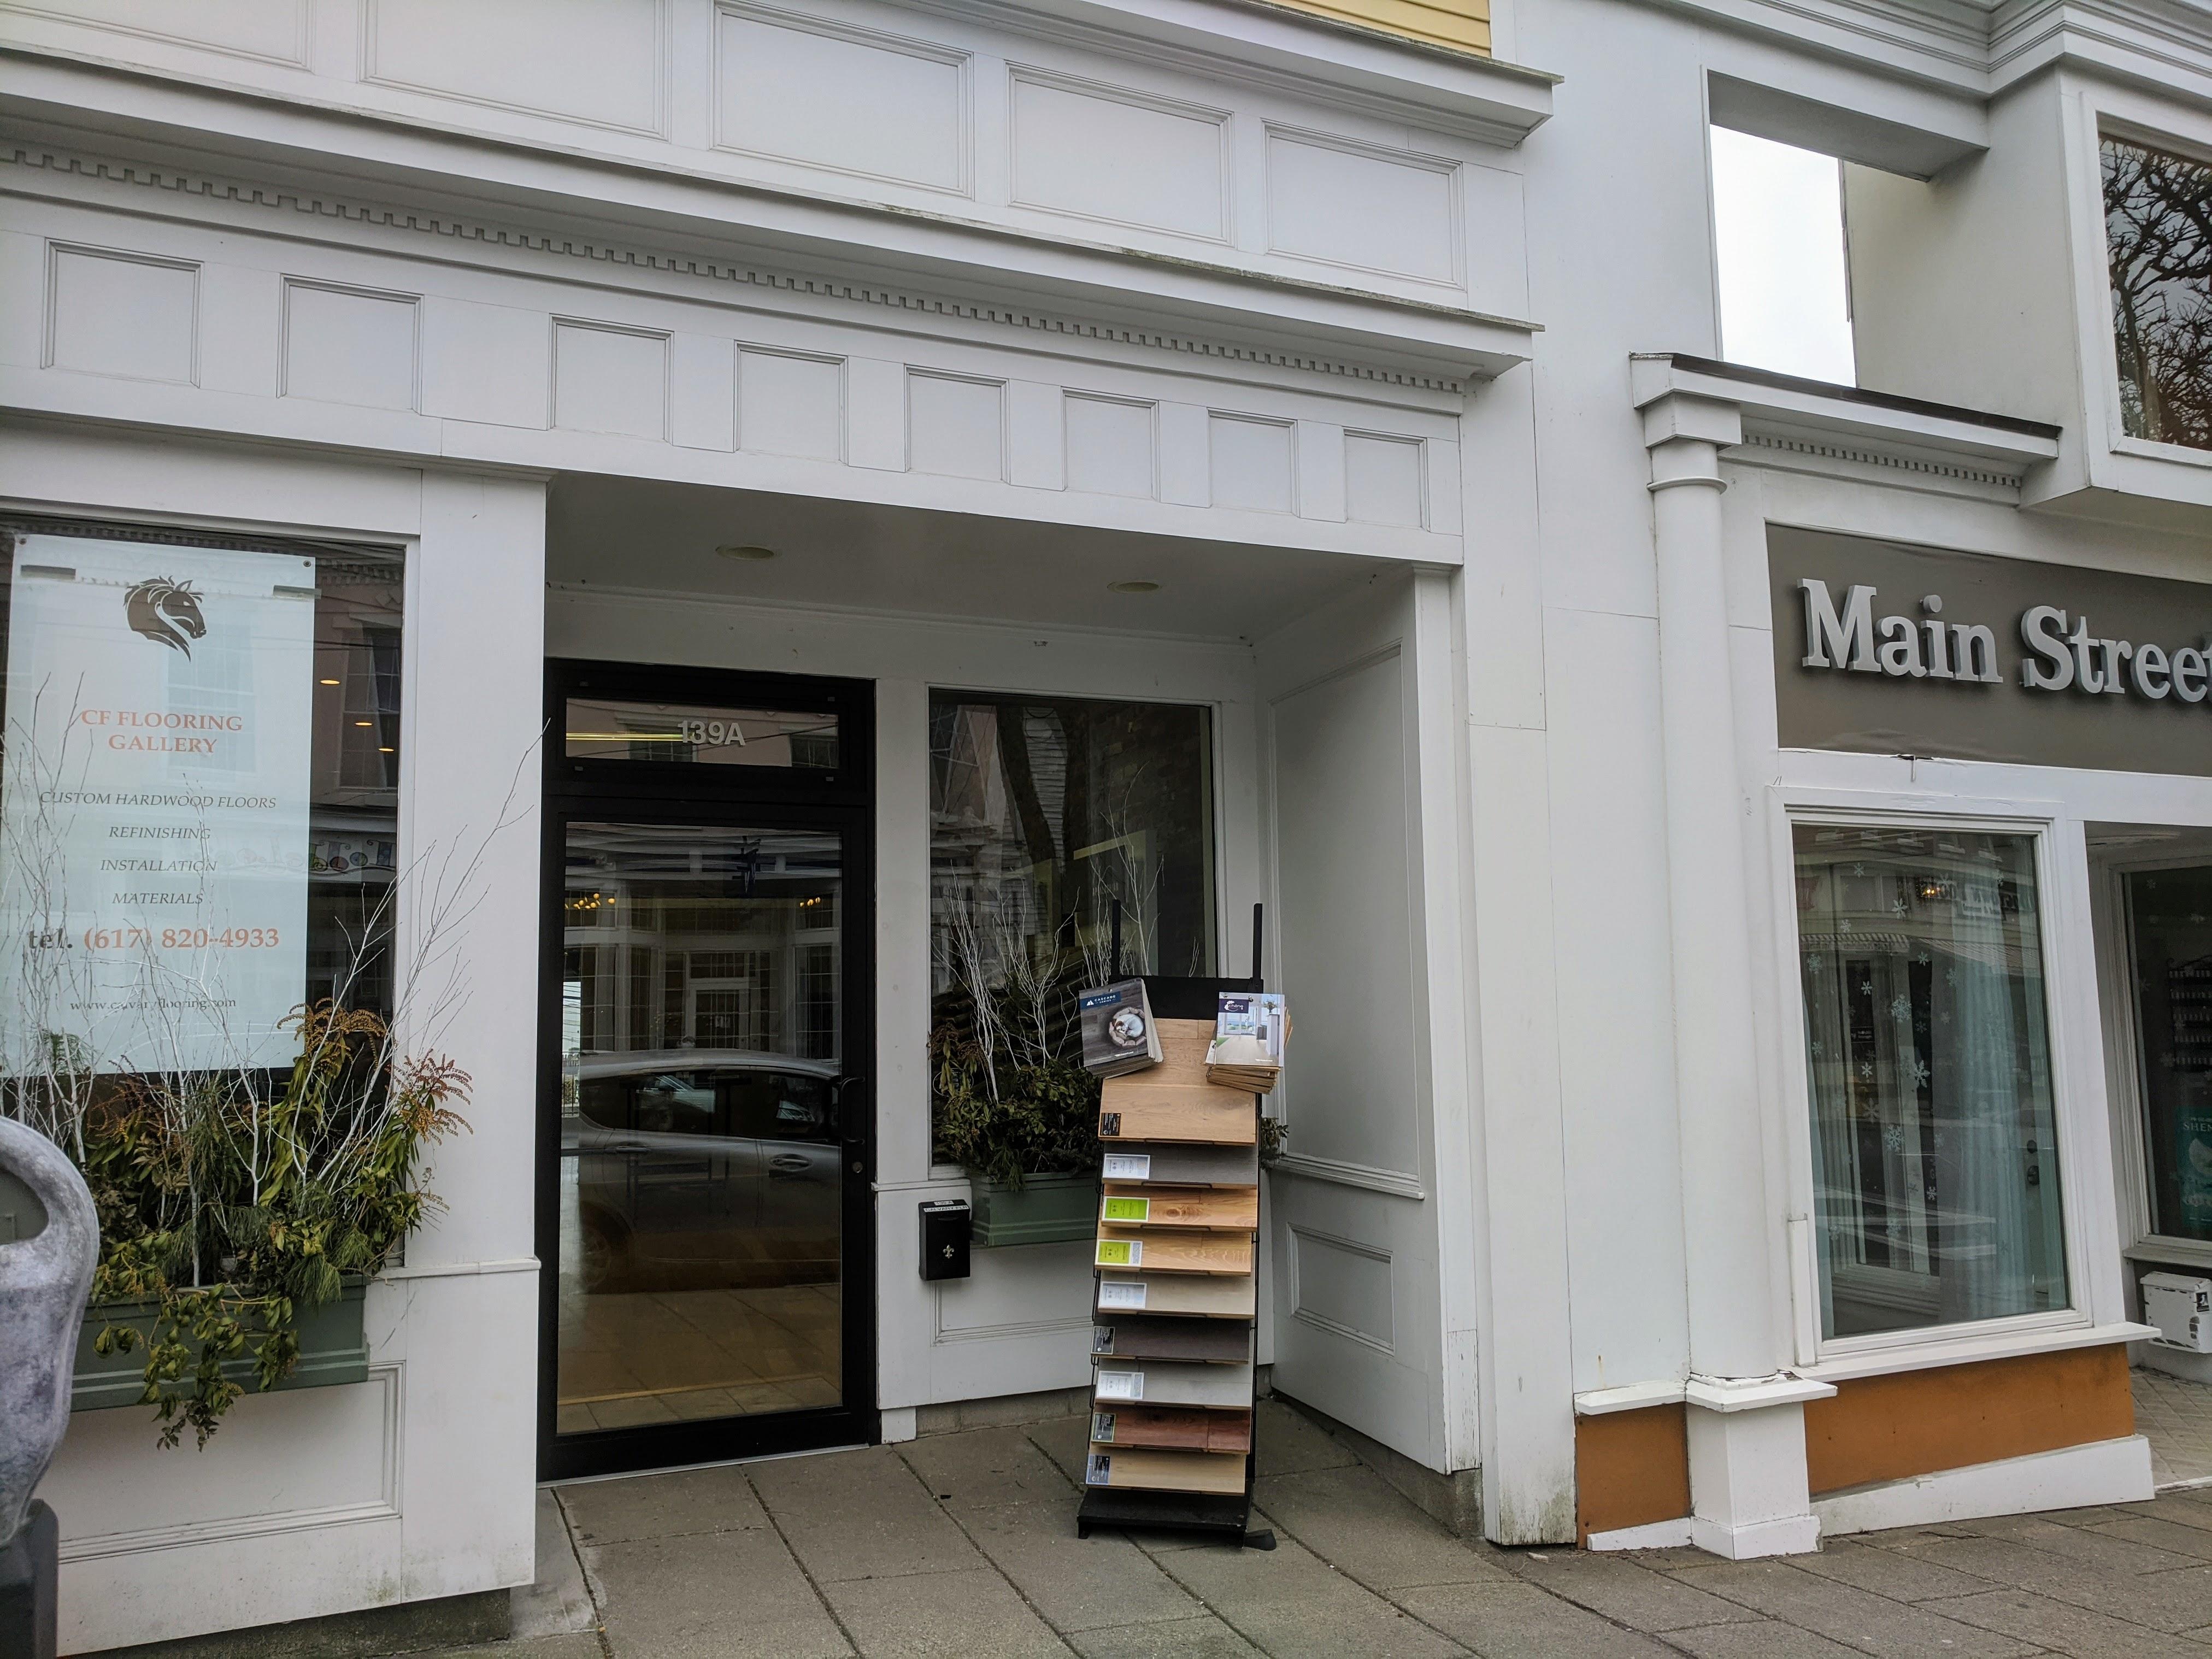 CF Flooring Gallery 139A Main Street Gloucester MA storefront ©c ryan